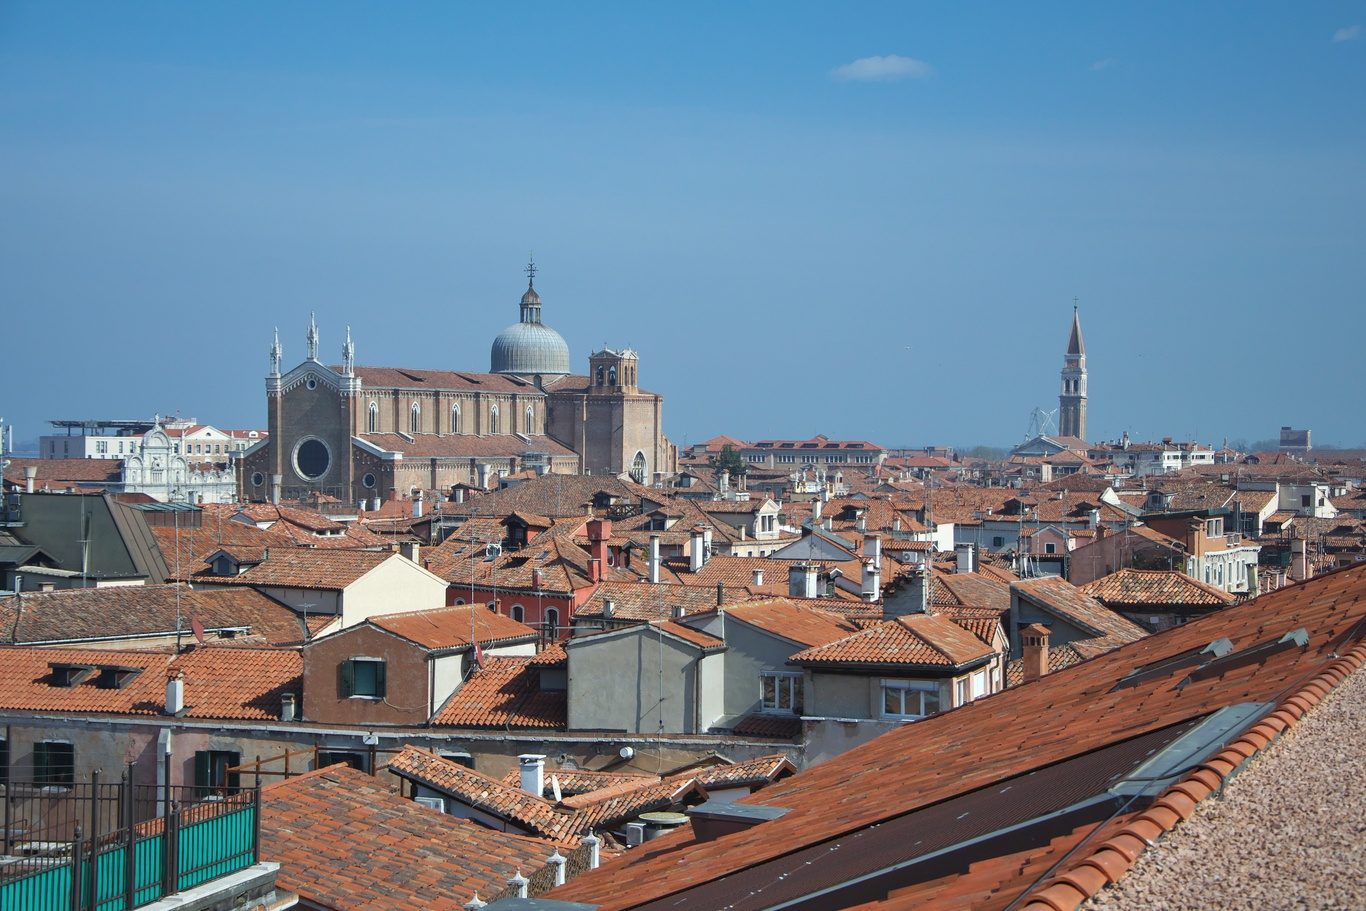 Výhled z terasy paláce T Fondaco dei Tedeschi